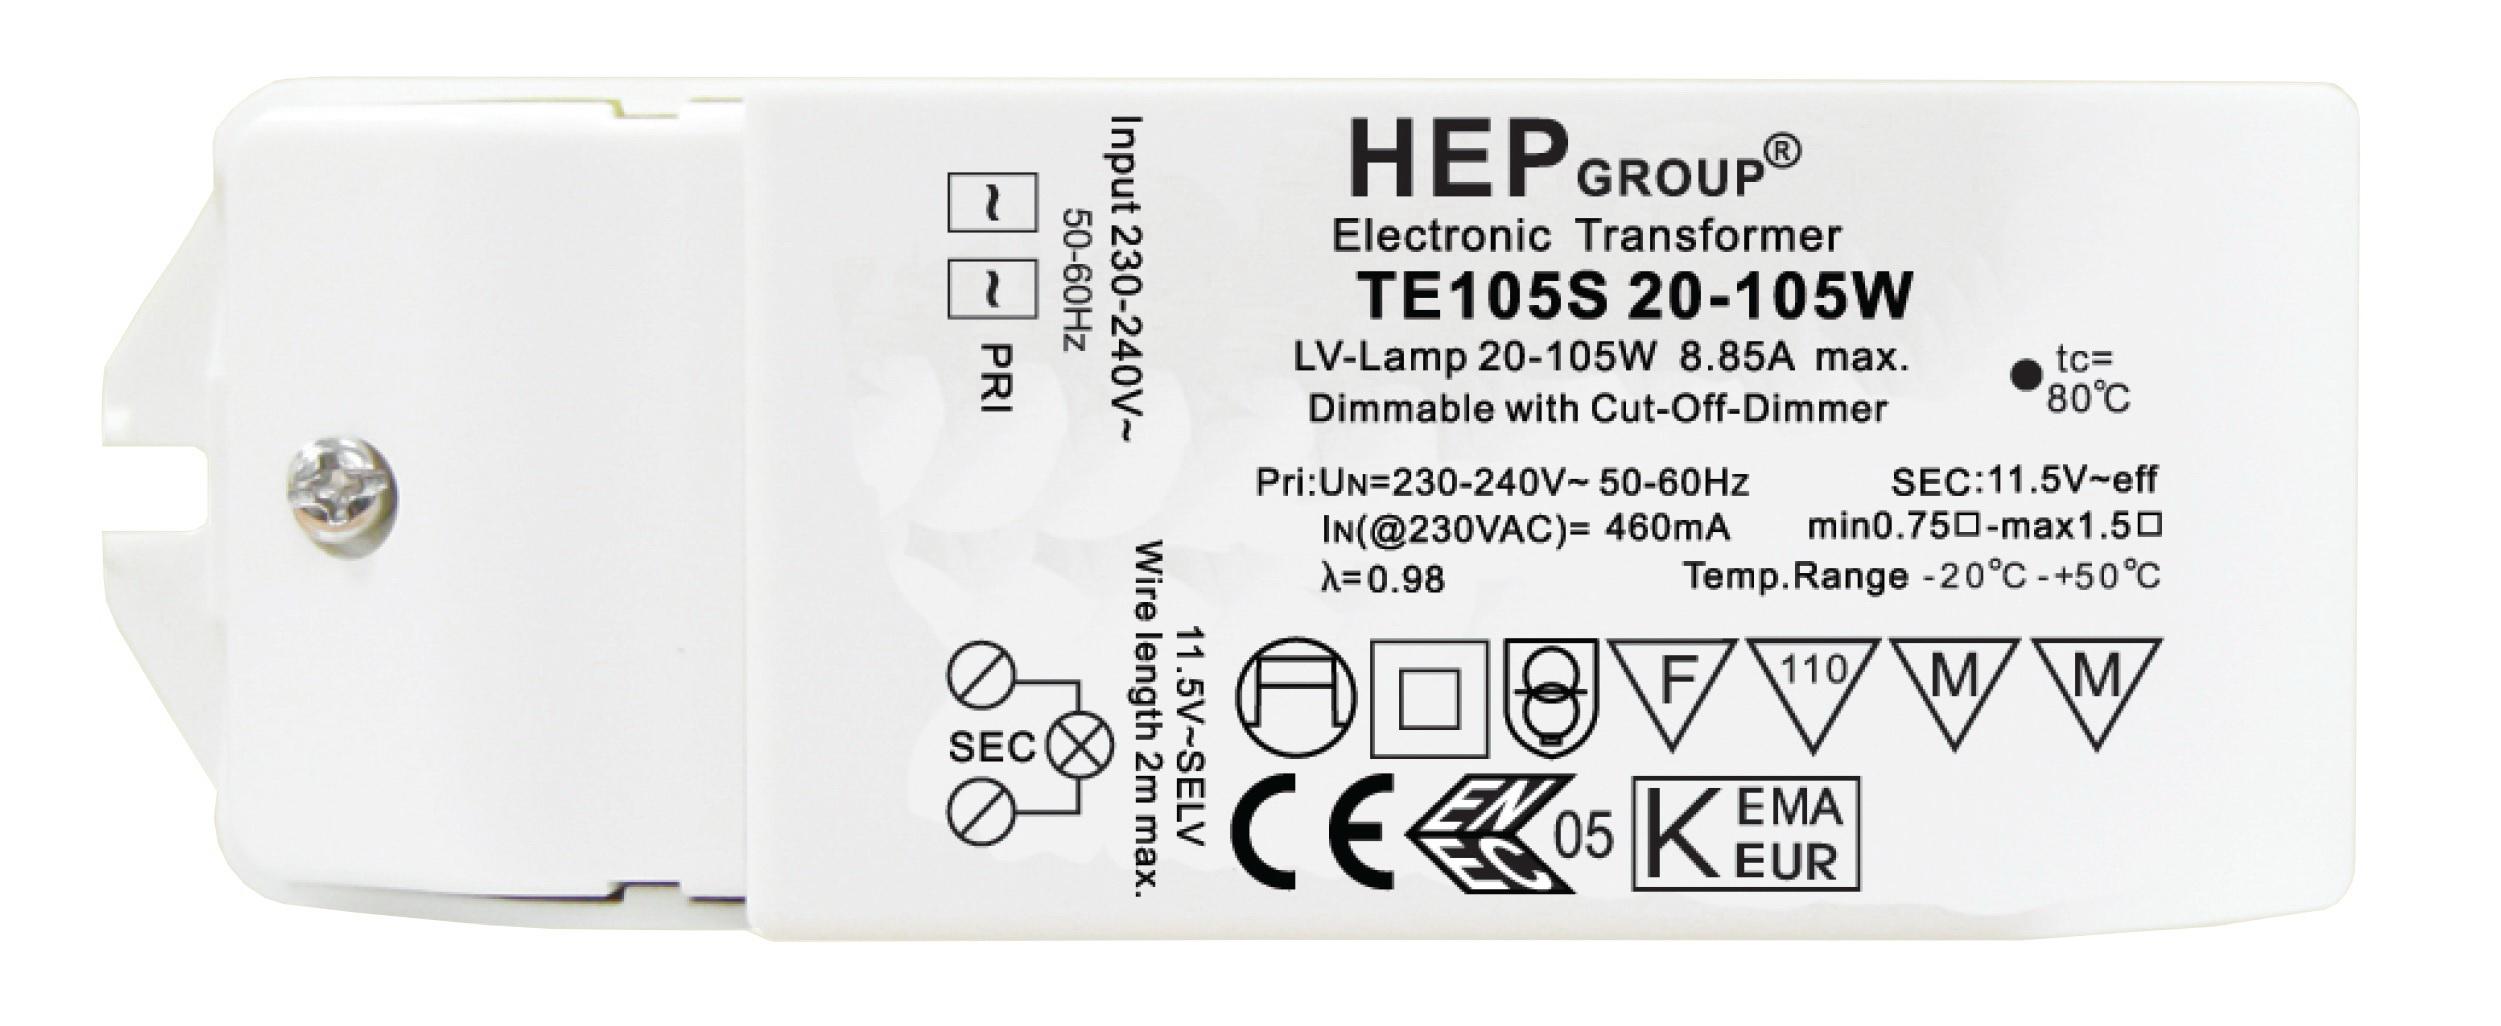 1 Stk Elektronischer Transformator, 240/12V, 50-150VA, Dimm LI5ZTL150S